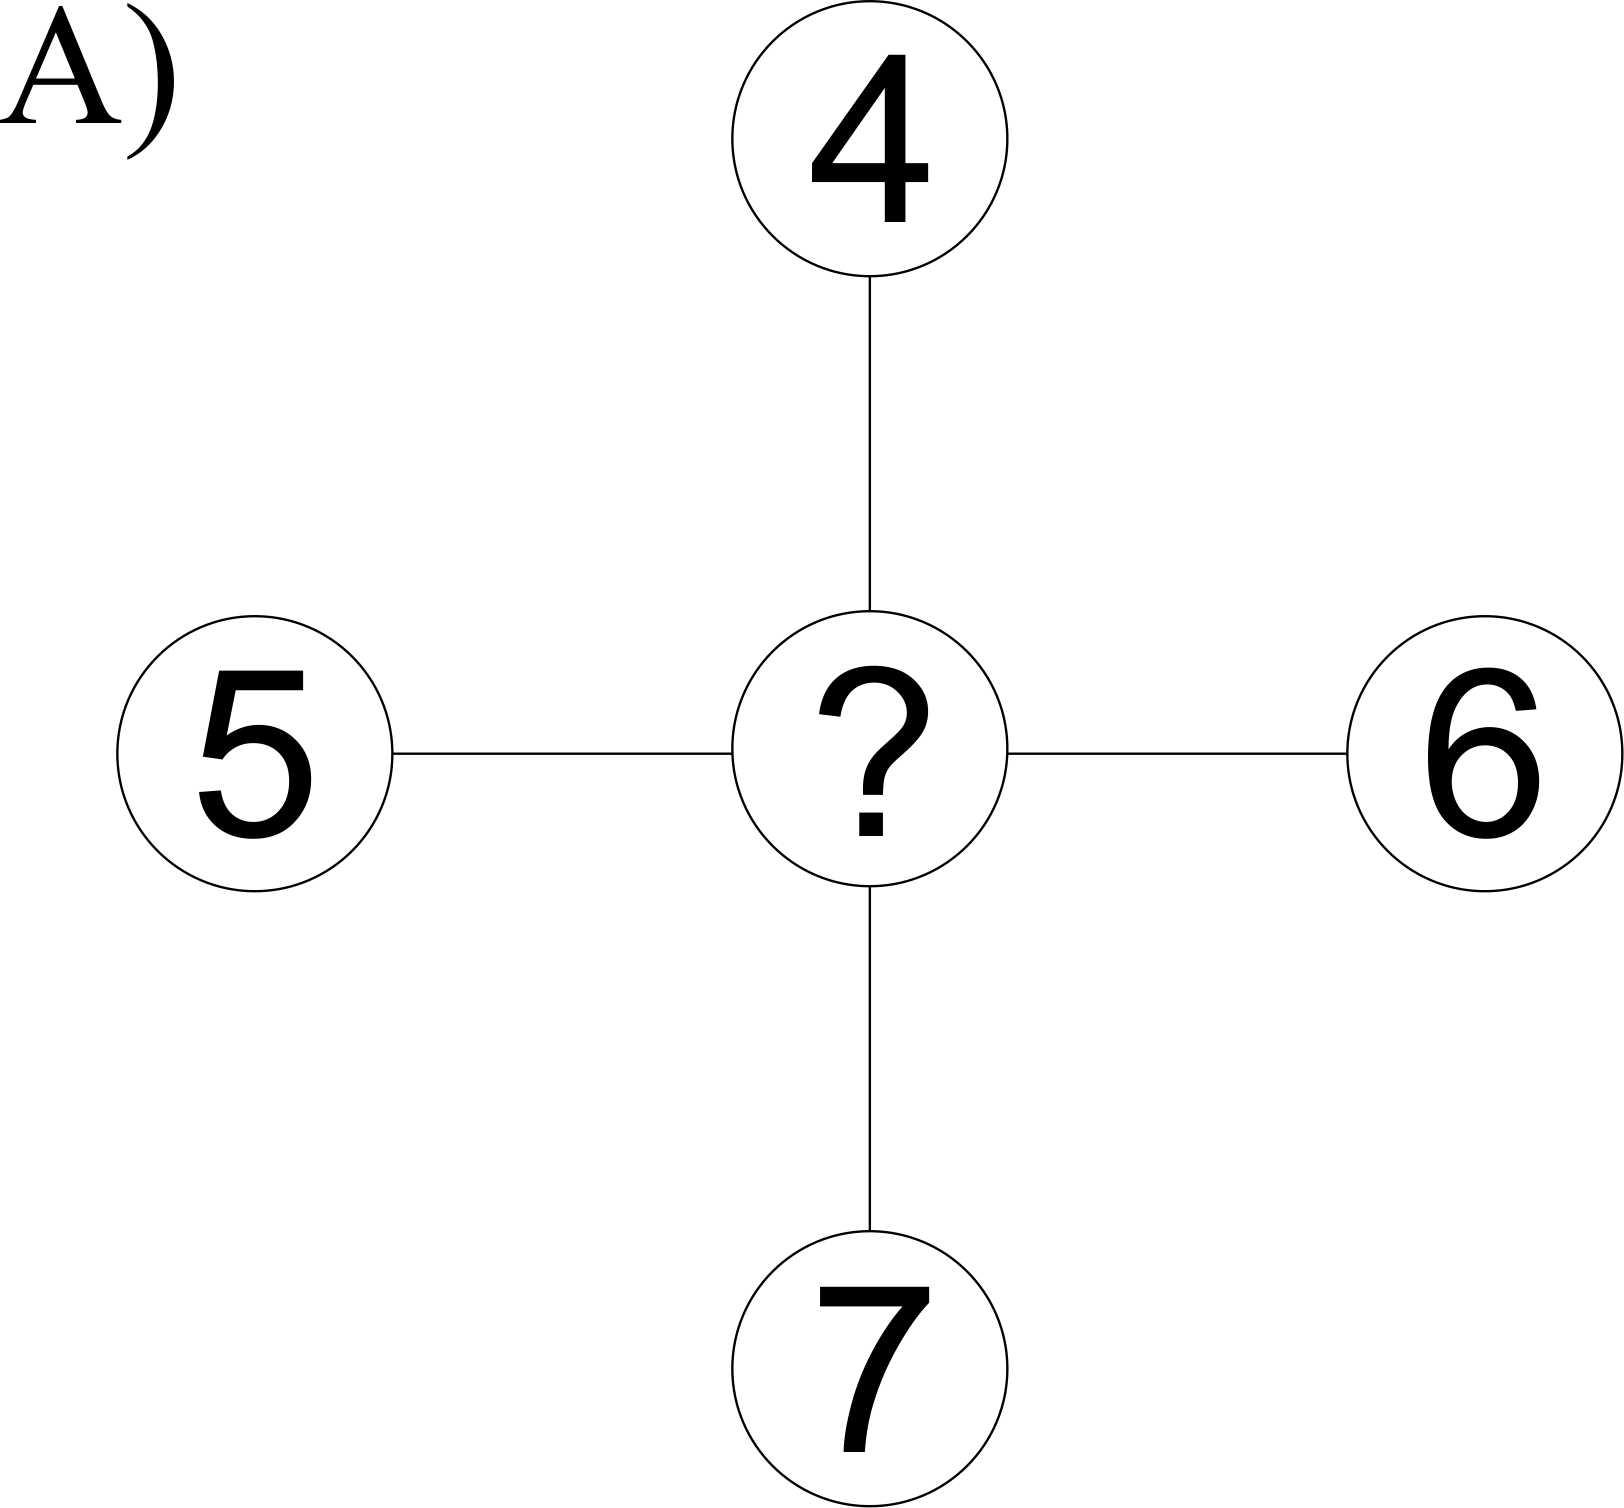 C:\Users\guron\Desktop\Резервная_копия_Резервная_копия_Резервная_копия_Резервная_копия_маршрут.jpg